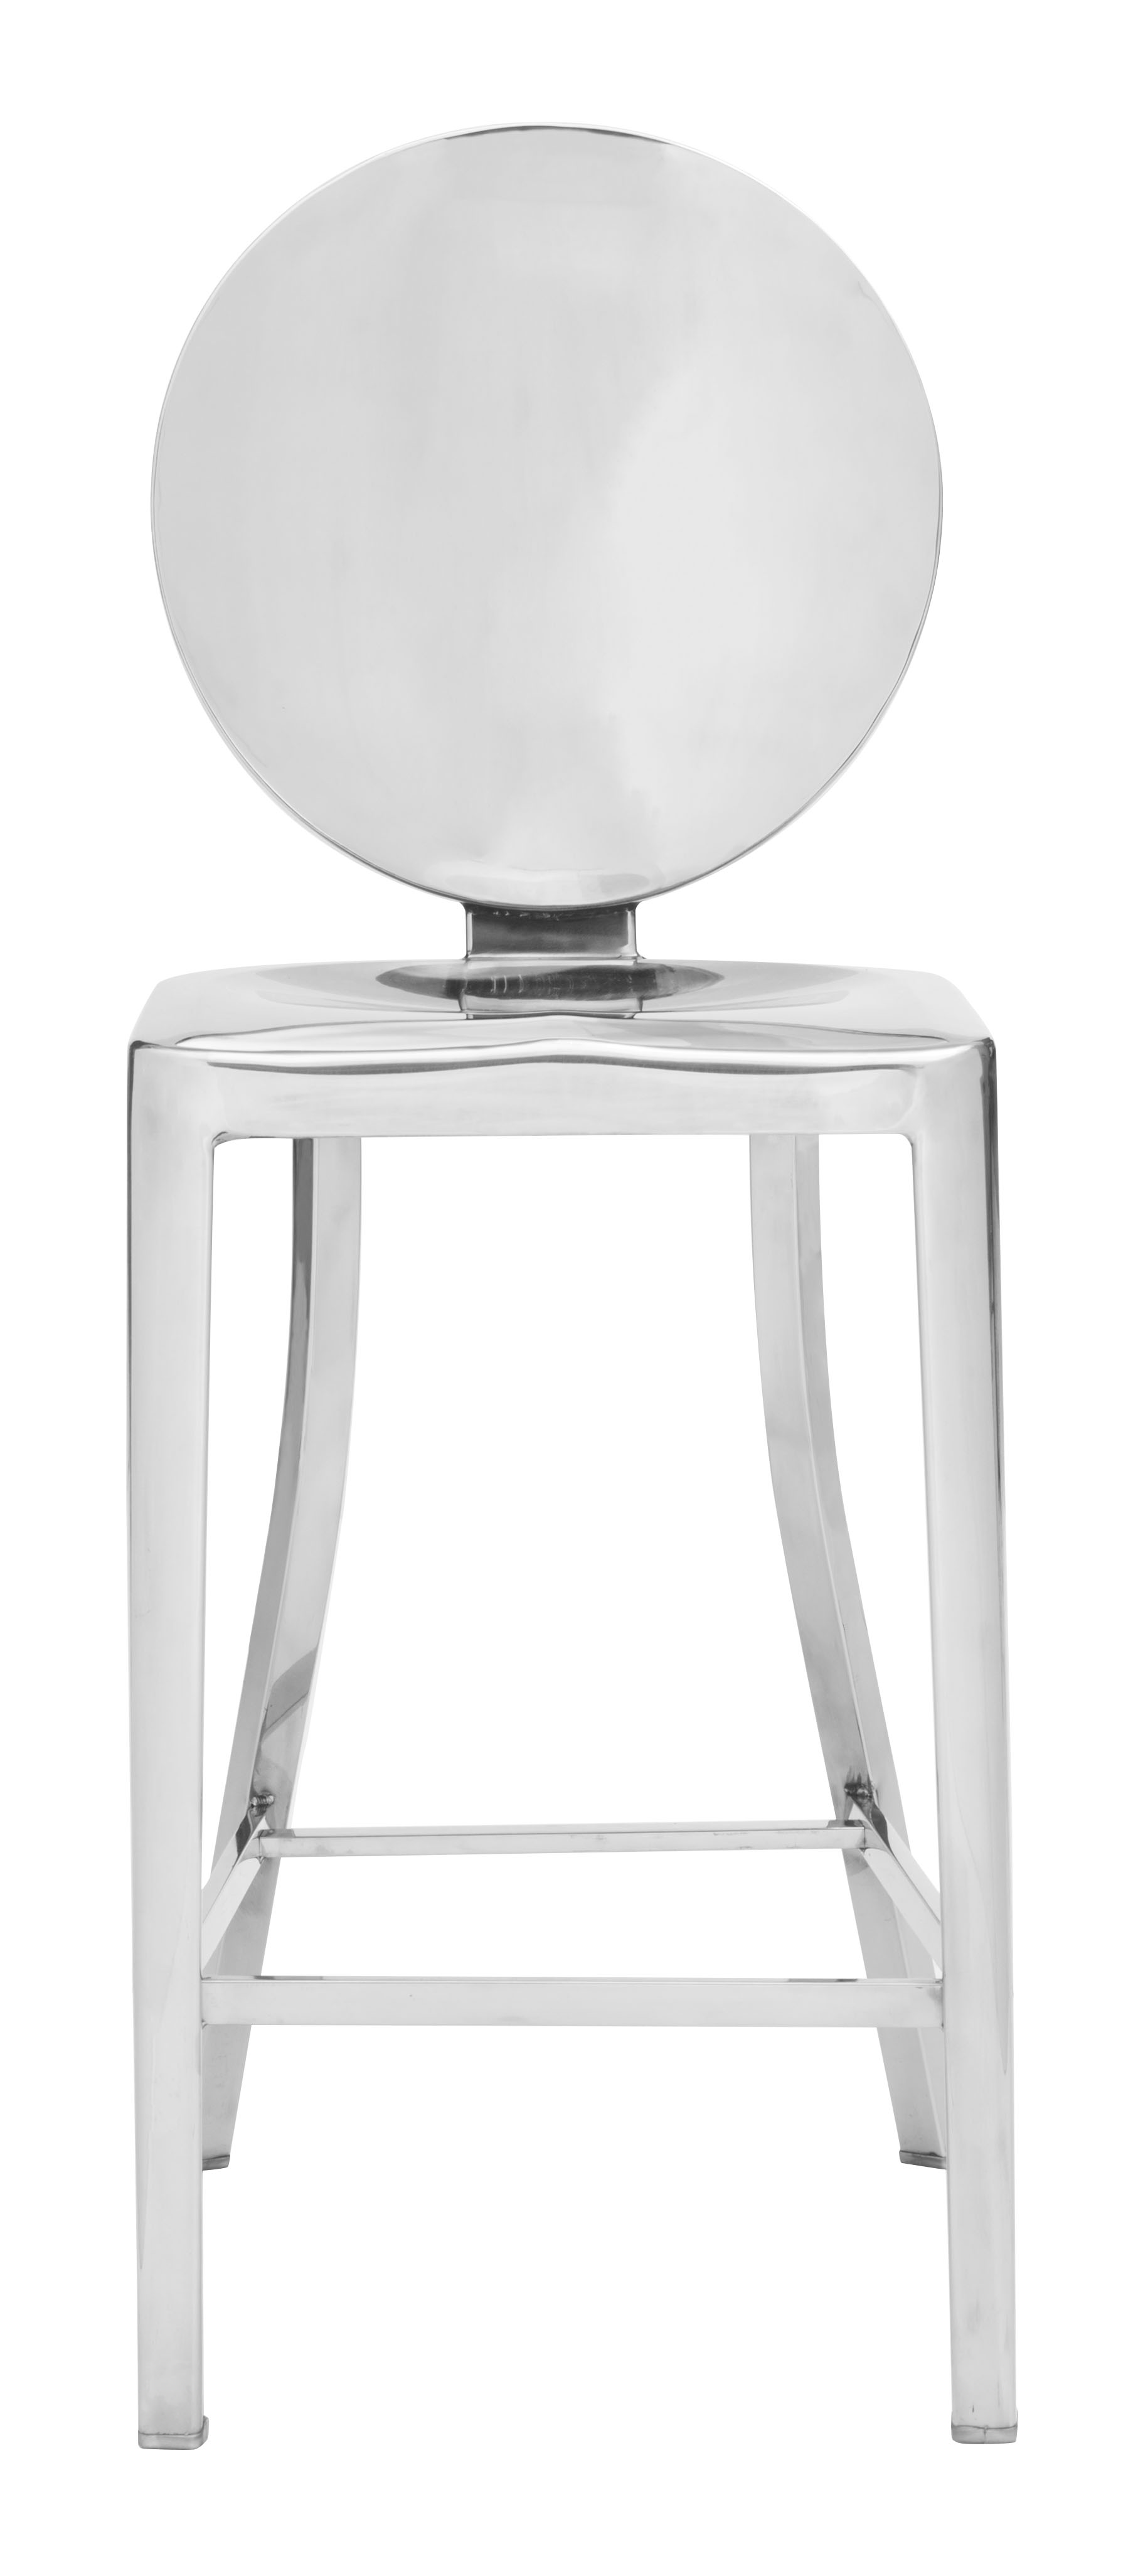 autumn-counter-chair-stool.jpg